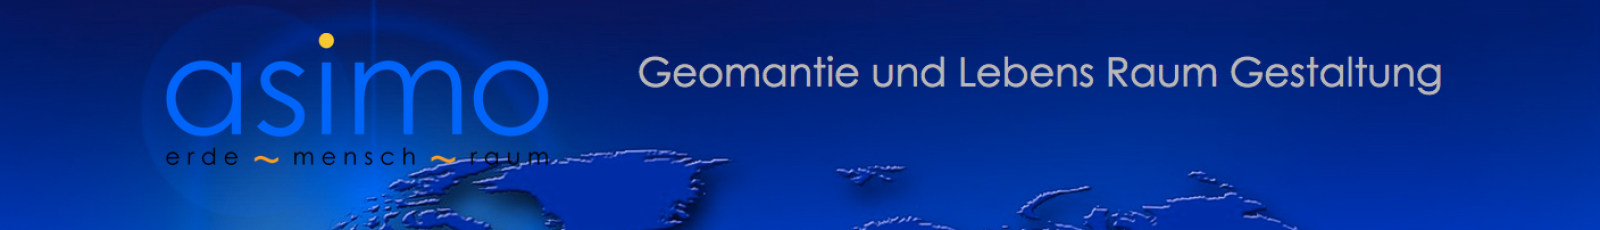 Geomantie Beratung Geomantie Ausbildung Stephan Kordick asimo Geomantie